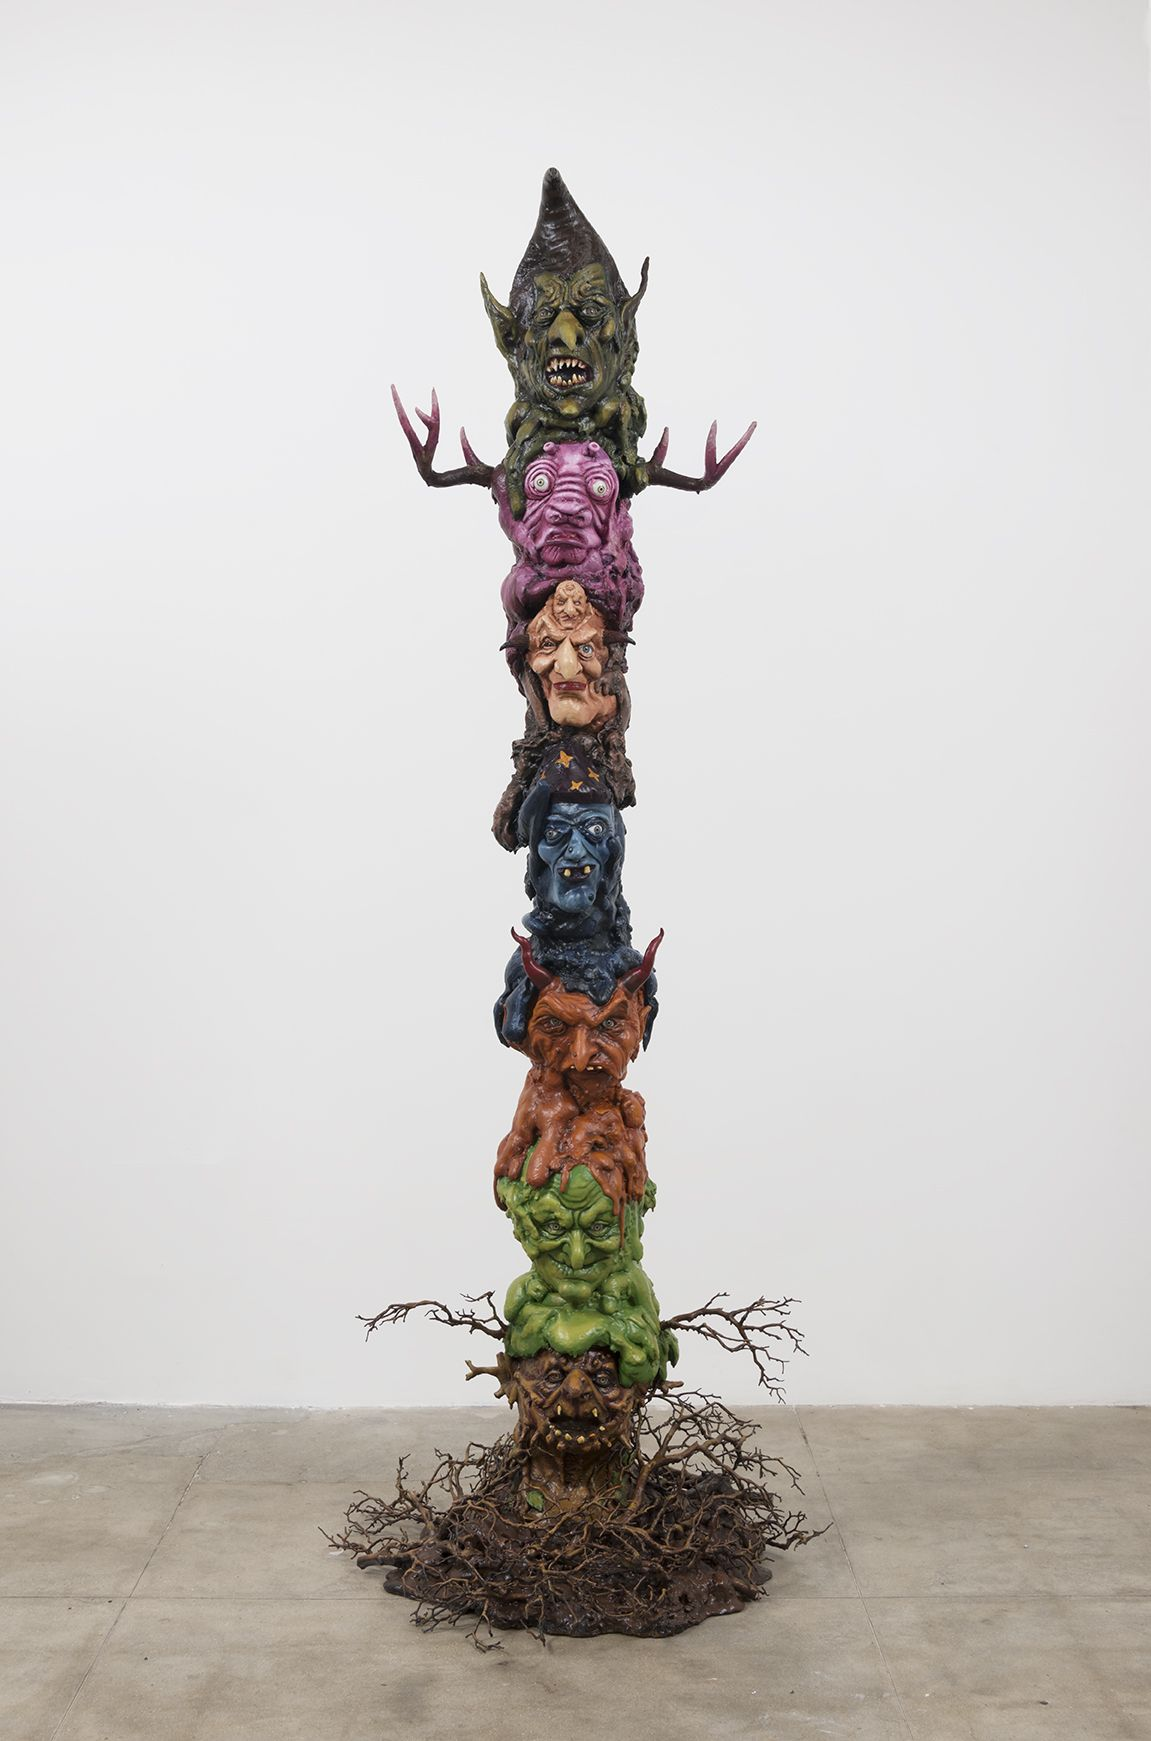 Witch Totem, 2016, Halloween masks, glass eyes, expanding foam, magi-sculpt, polyurethane horns, polyurethane branches, resin, acrylic paint, metal base, wooden pole